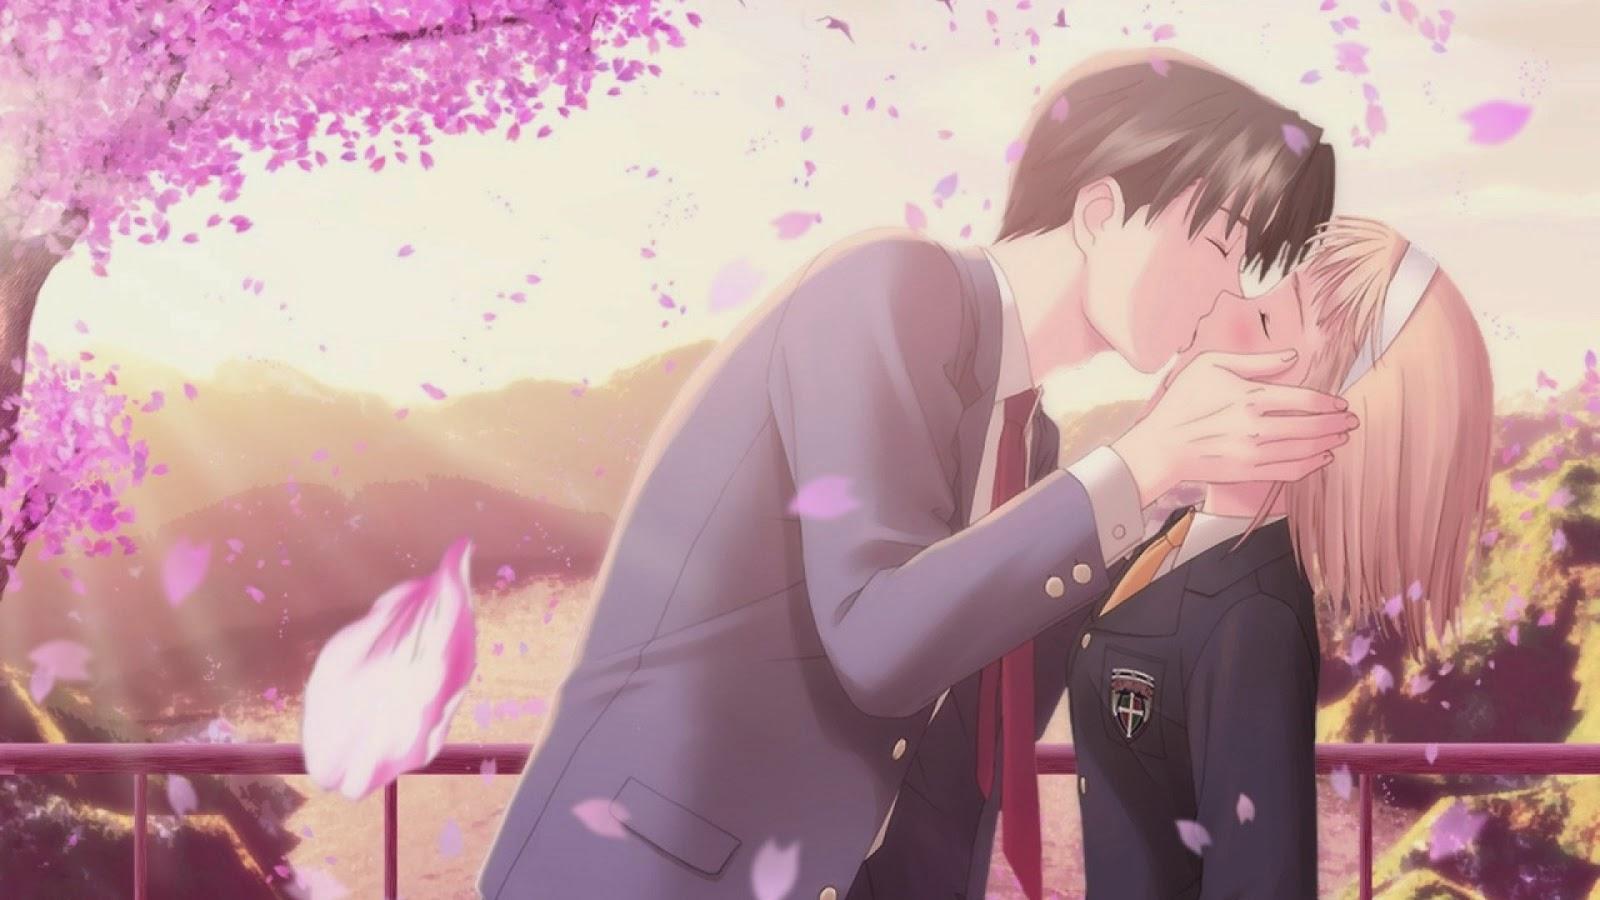 hình nền anime love